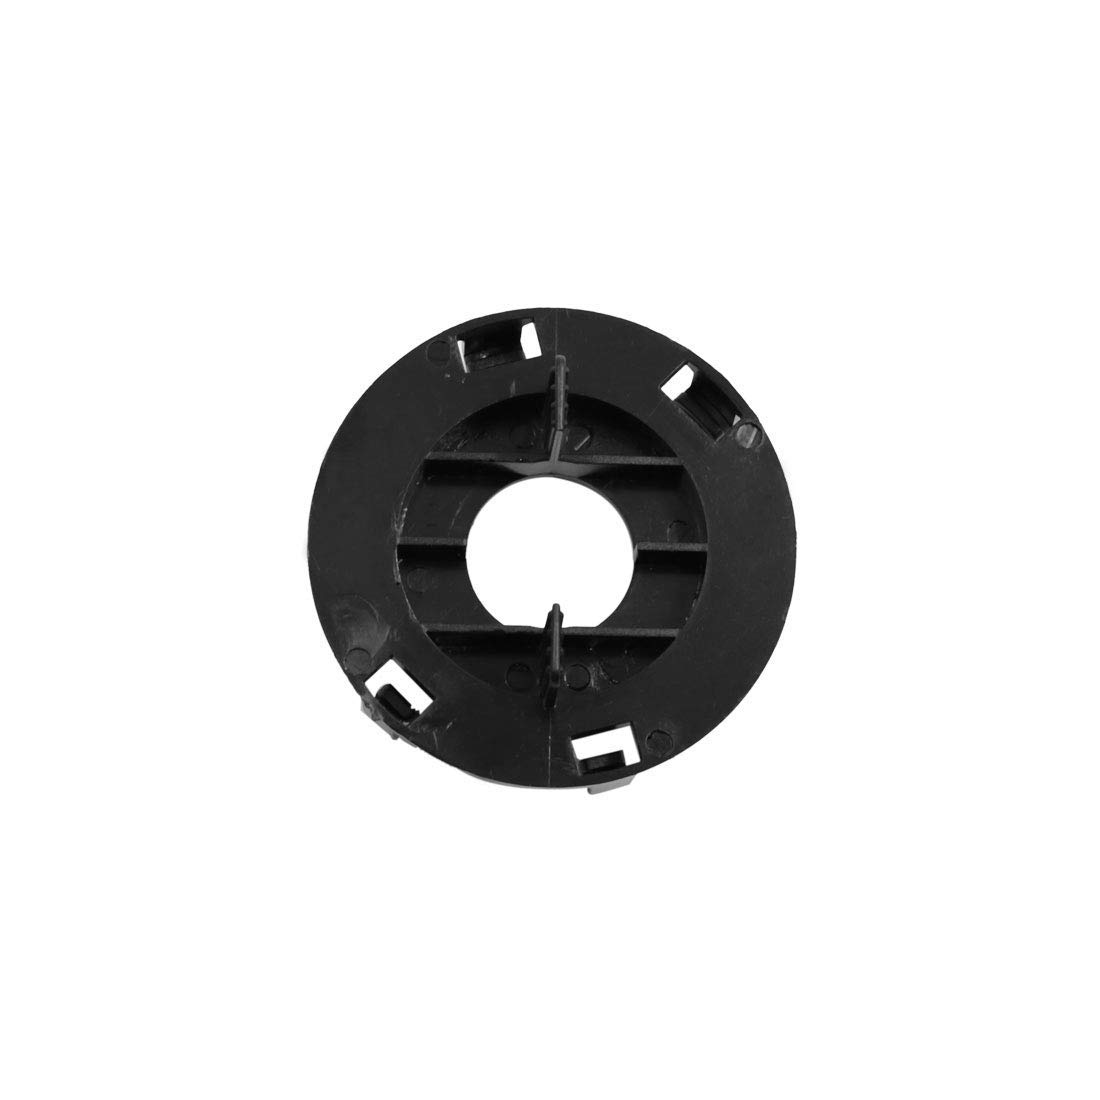 swh890308ca342508 SuperWarehouse Black Plastic Car LED Bulbs Head Lights Clip Adapter Holder for Hyundai Tucson